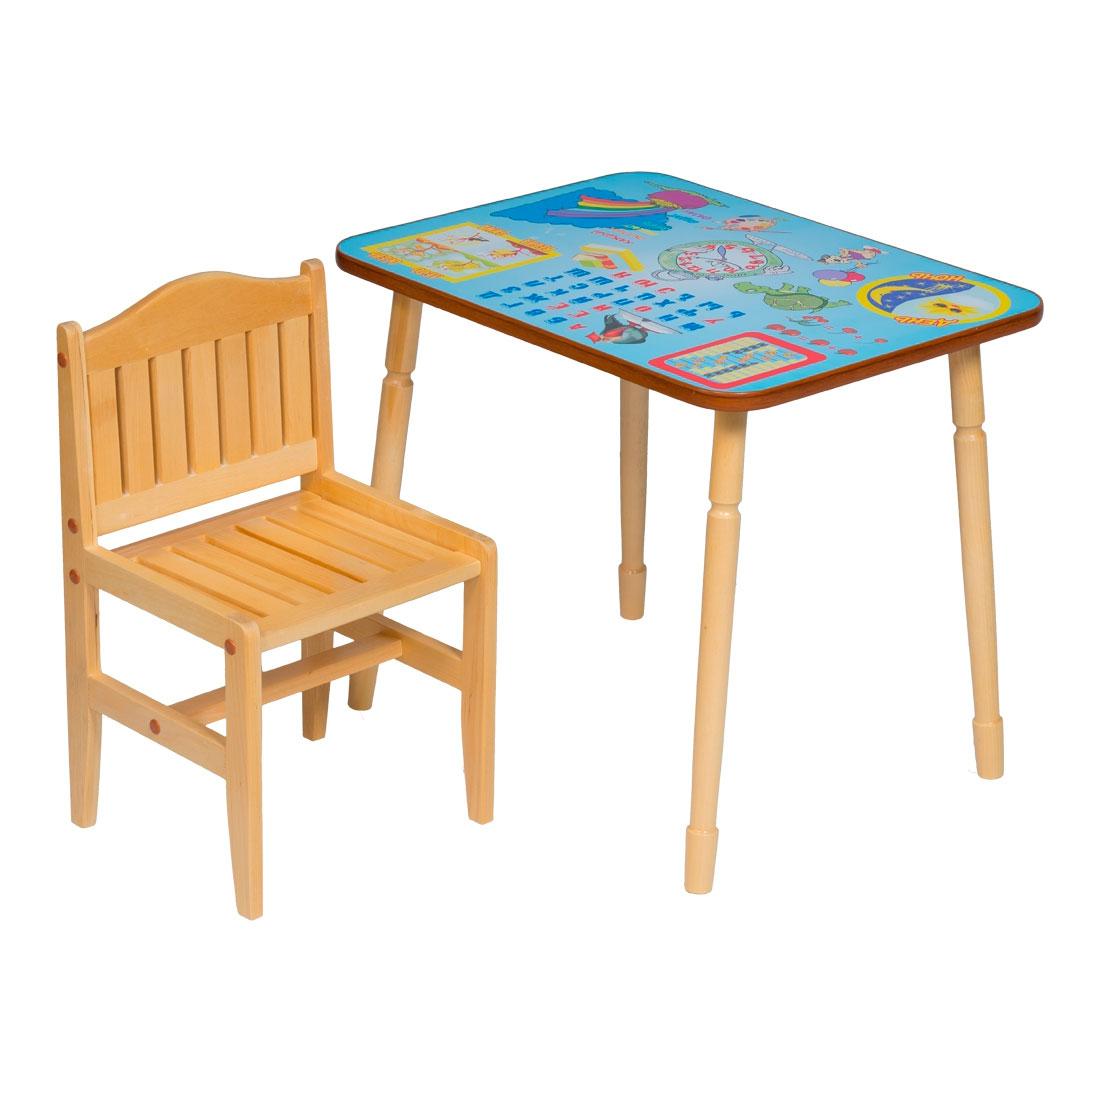 Набор мебели Папа Карло стол и стул Синий<br>